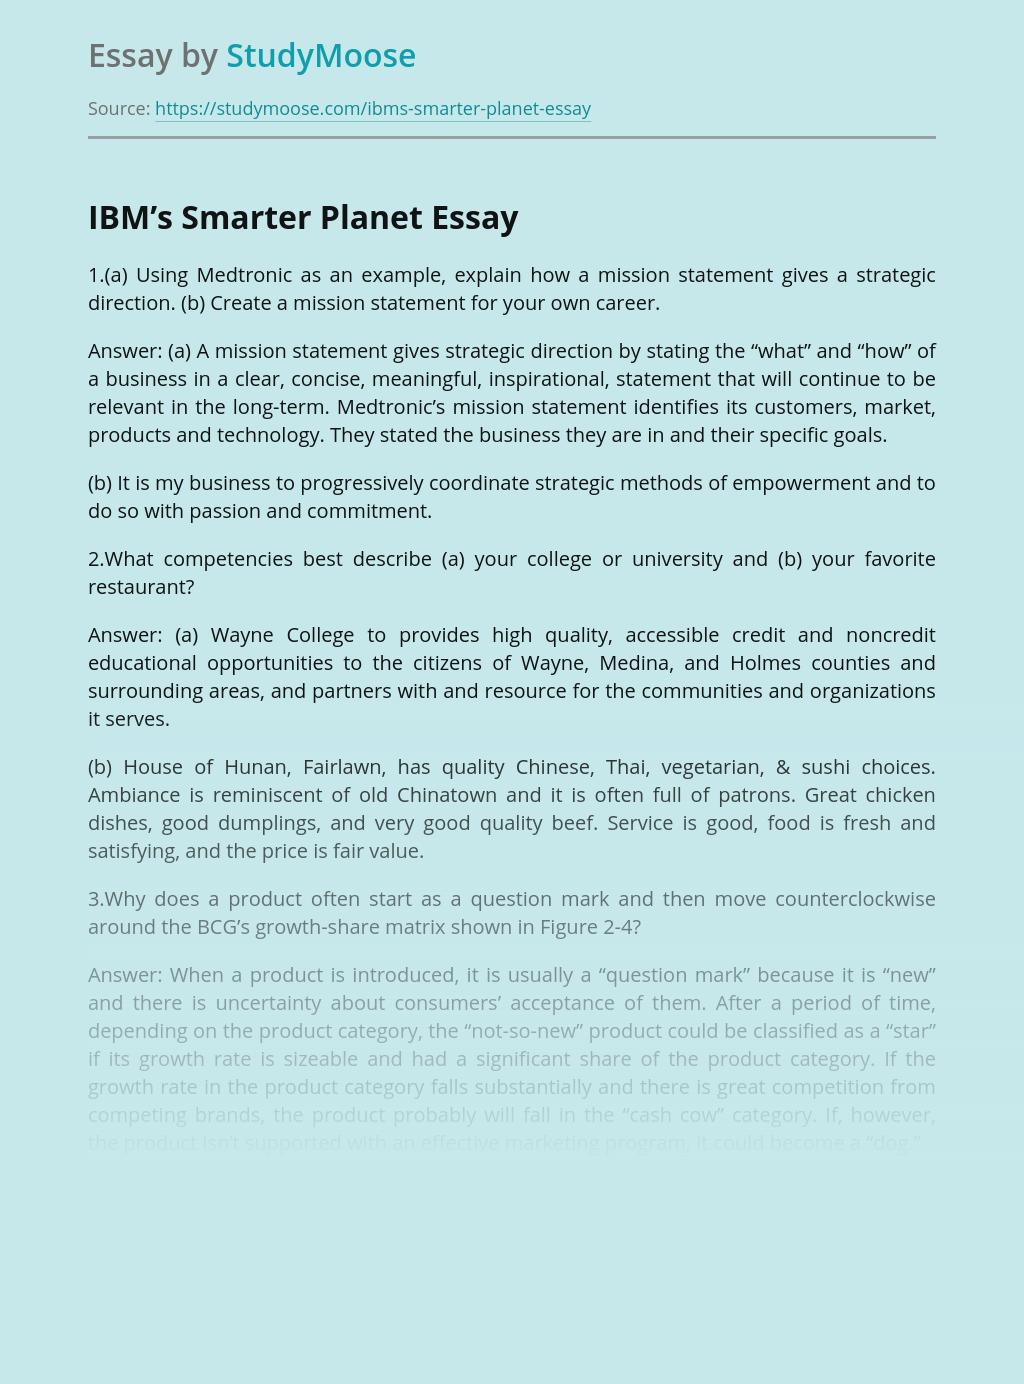 IBM's Smarter Planet